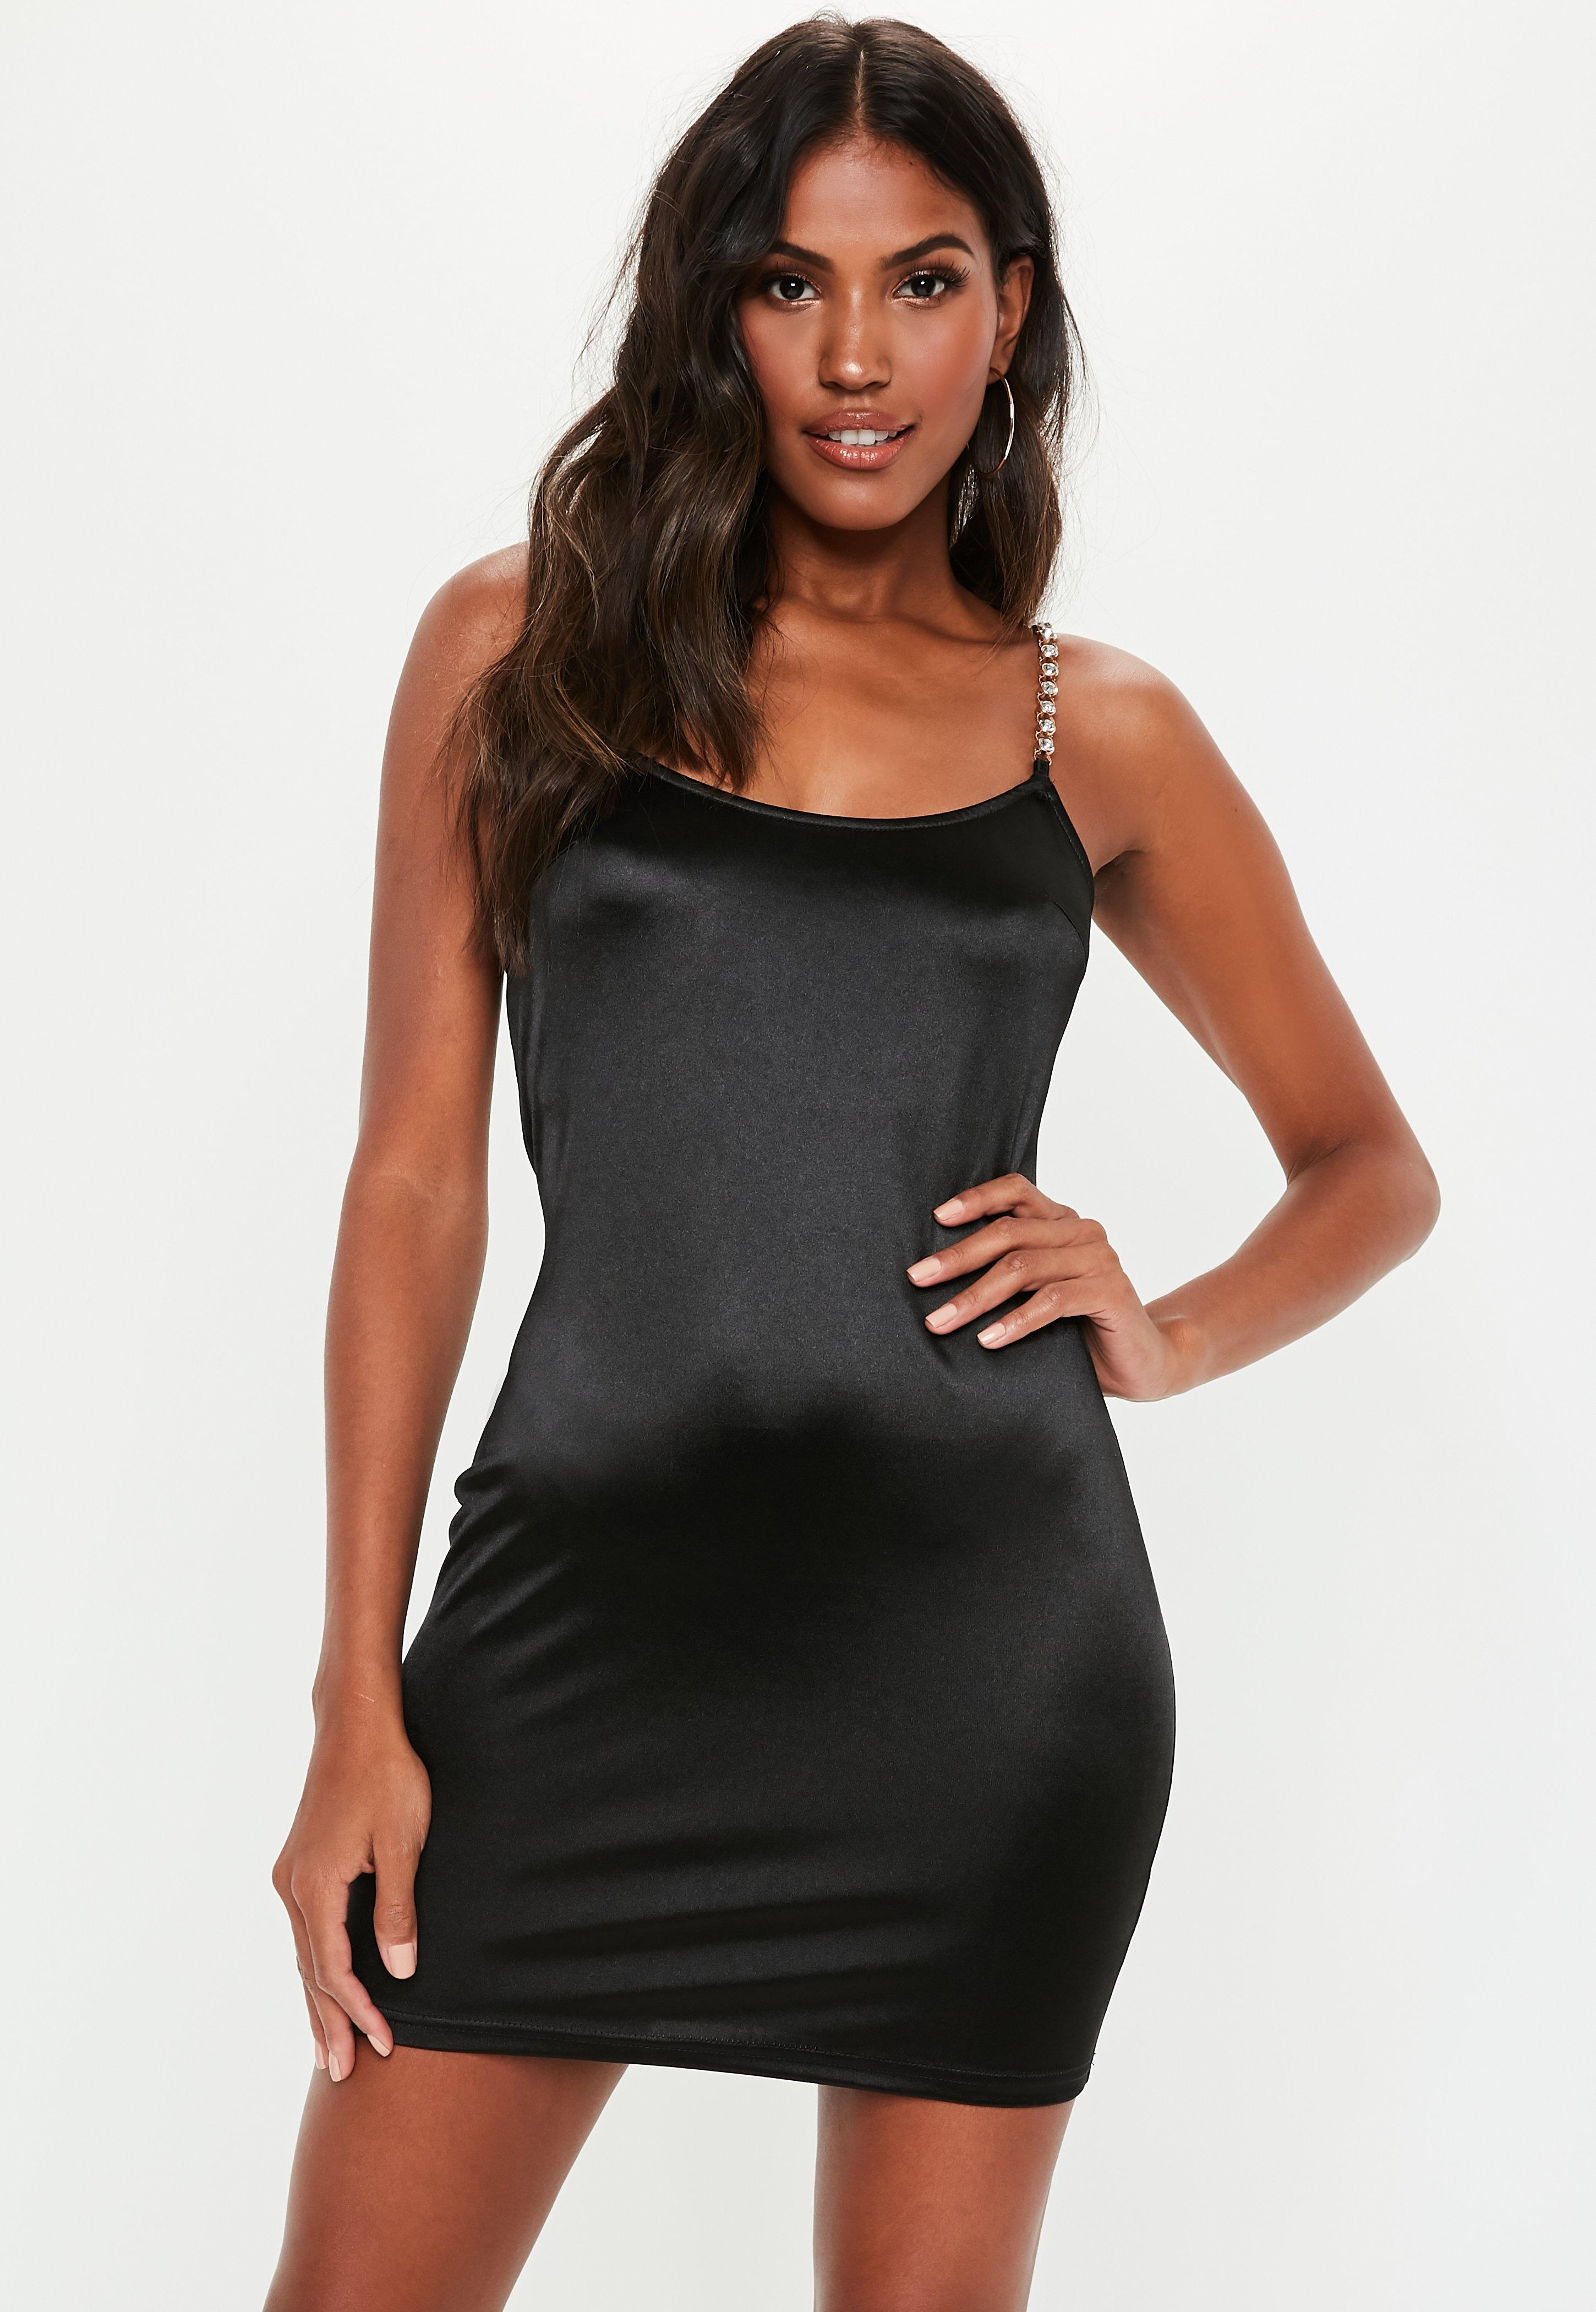 Agree, amusing erotic stretch satin dresses think, what